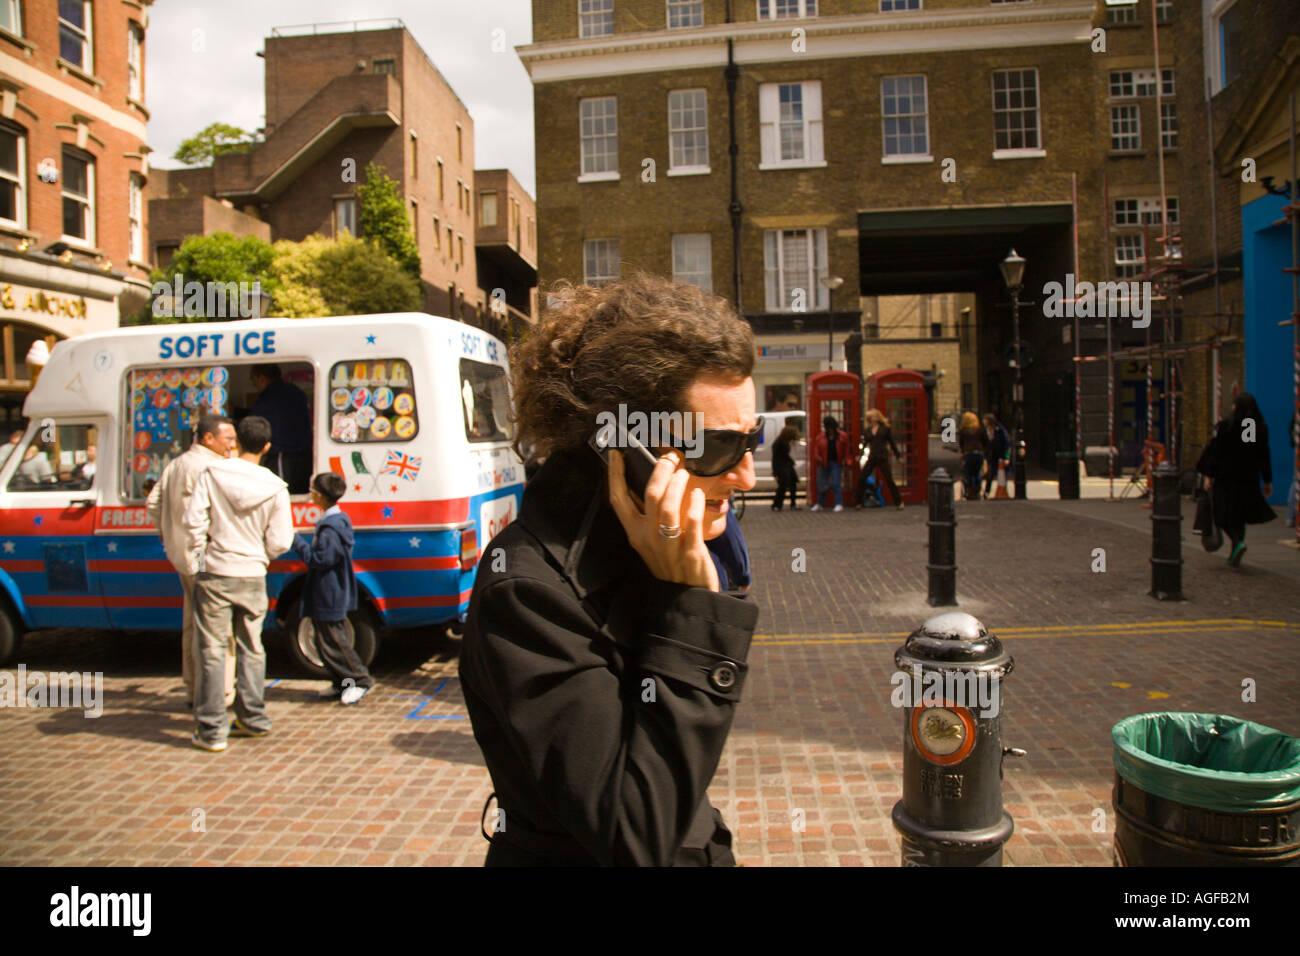 women on telephone in Covent Garden, London - Stock Image